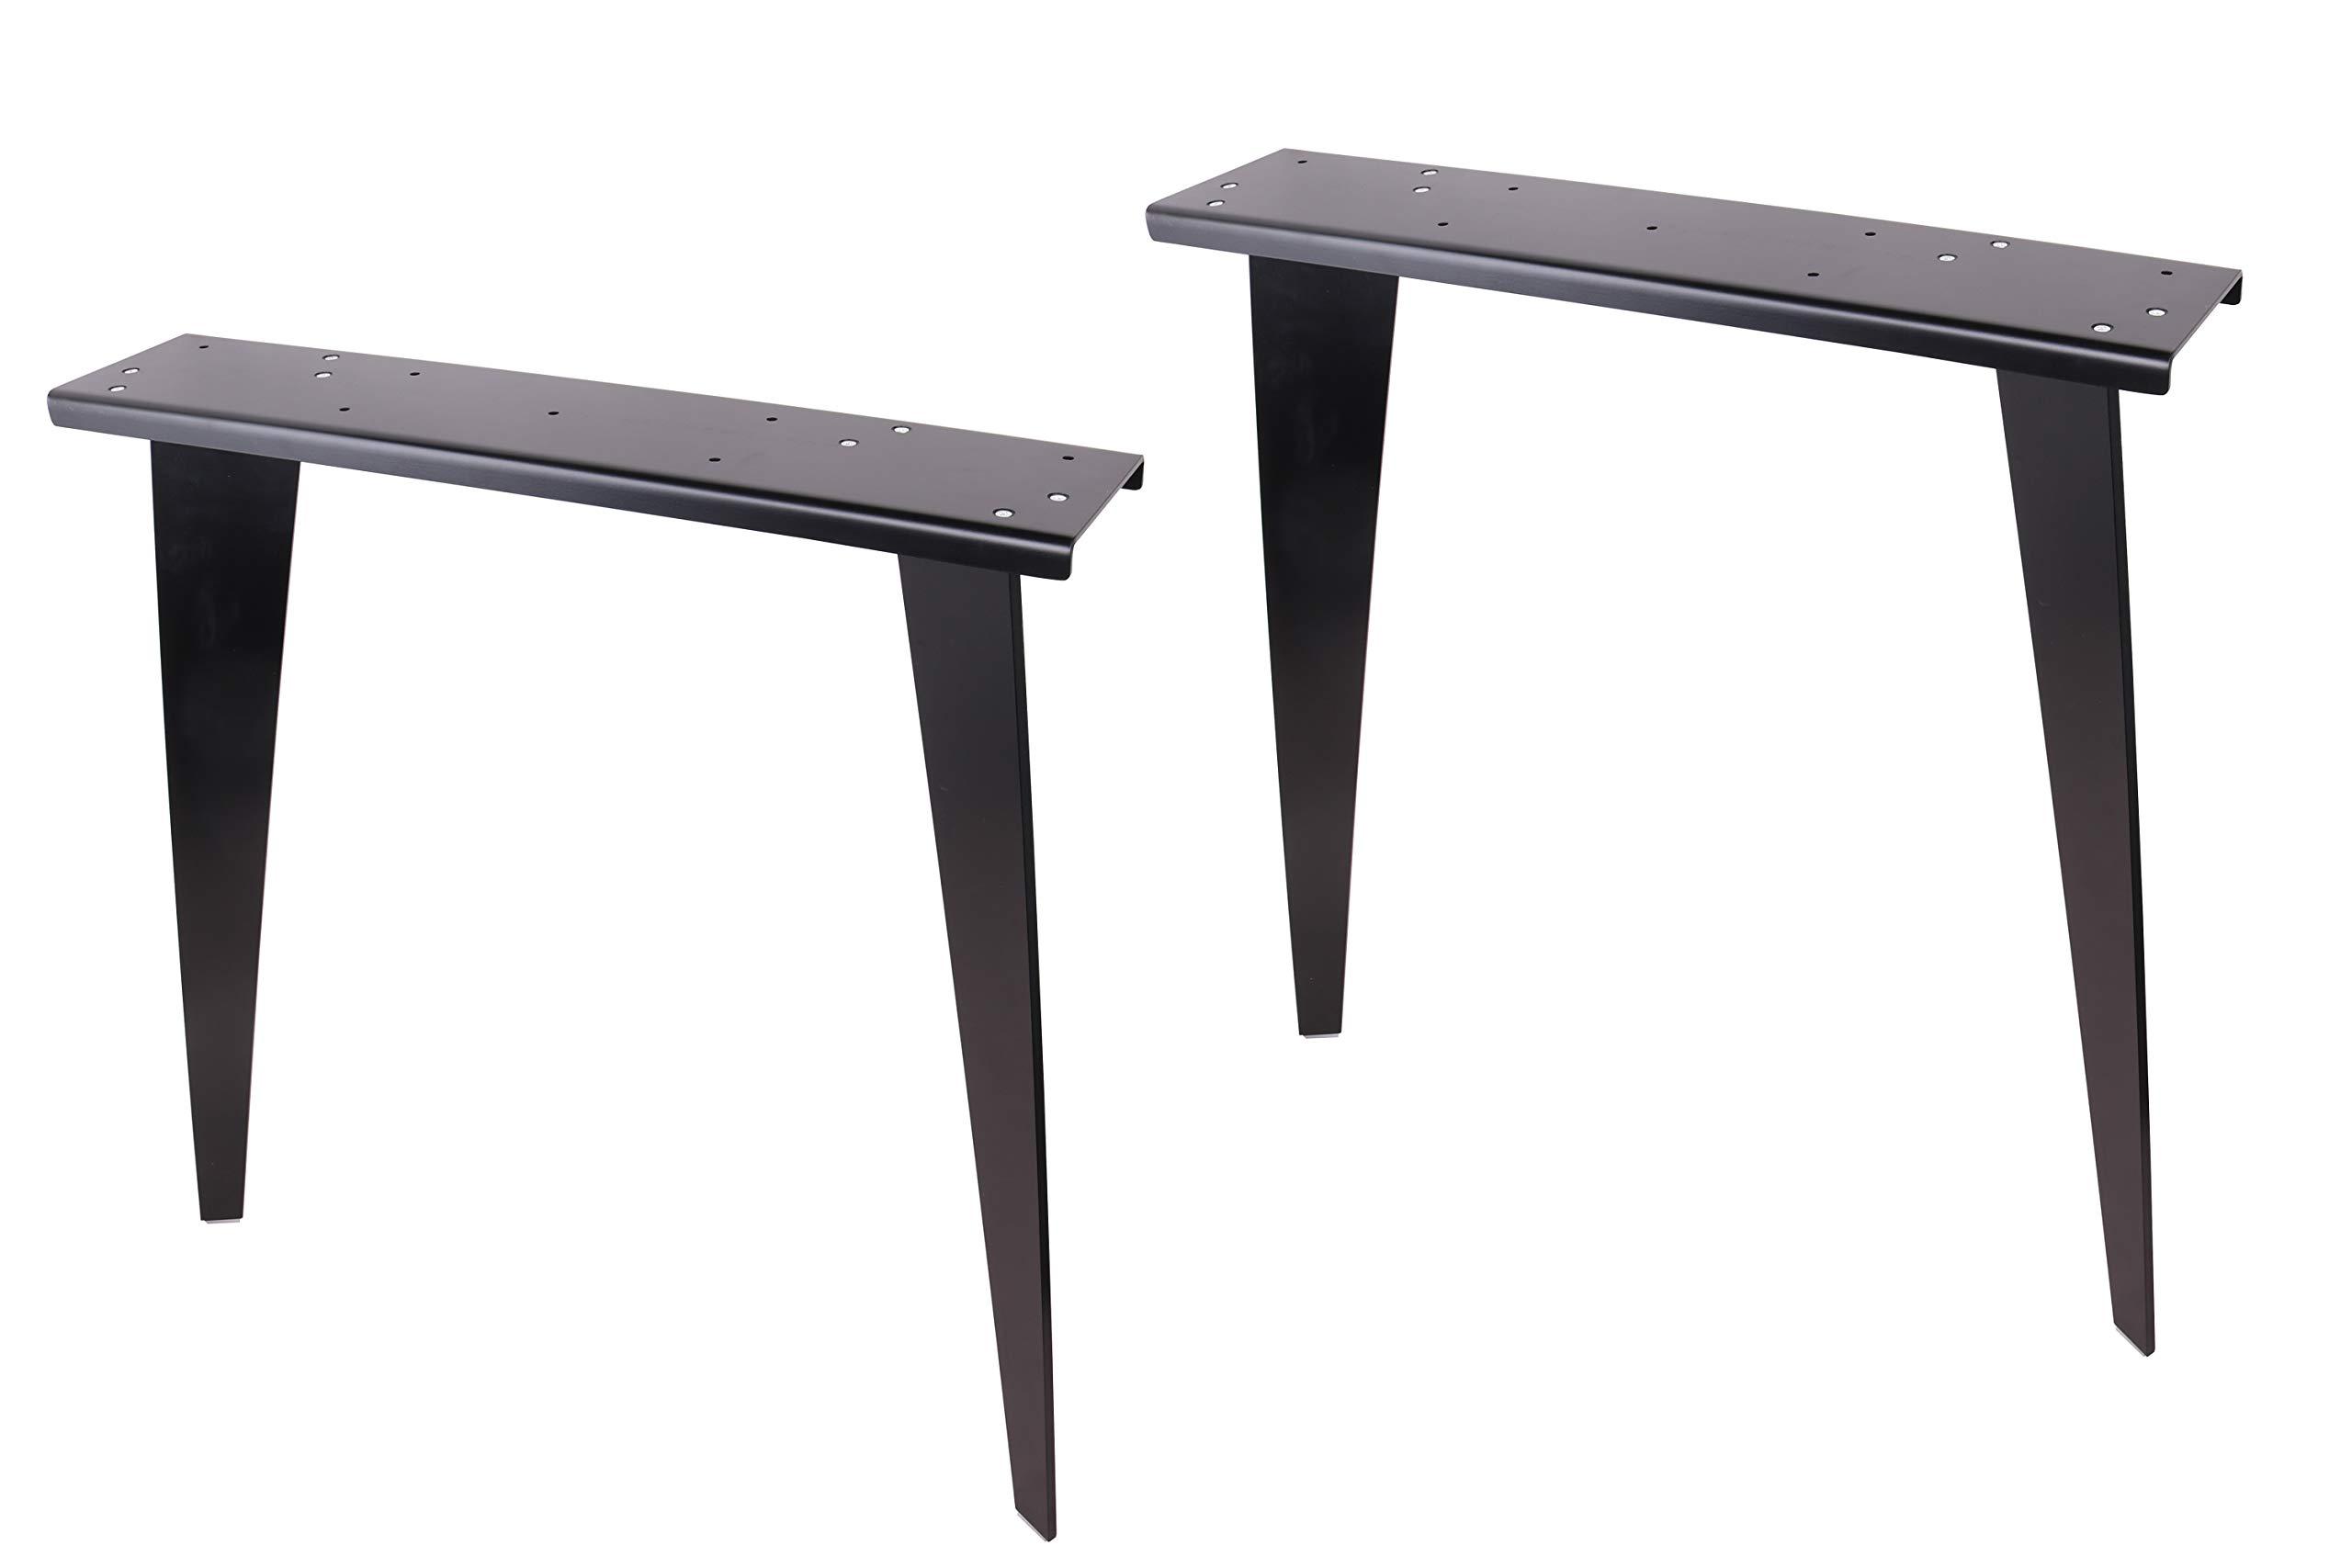 2 x 28'' Dining Table Legs, Black Solid Steel Table Legs, Office Table Legs,Computer Desk Legs,Industrial Kitchen Table Legs,Black